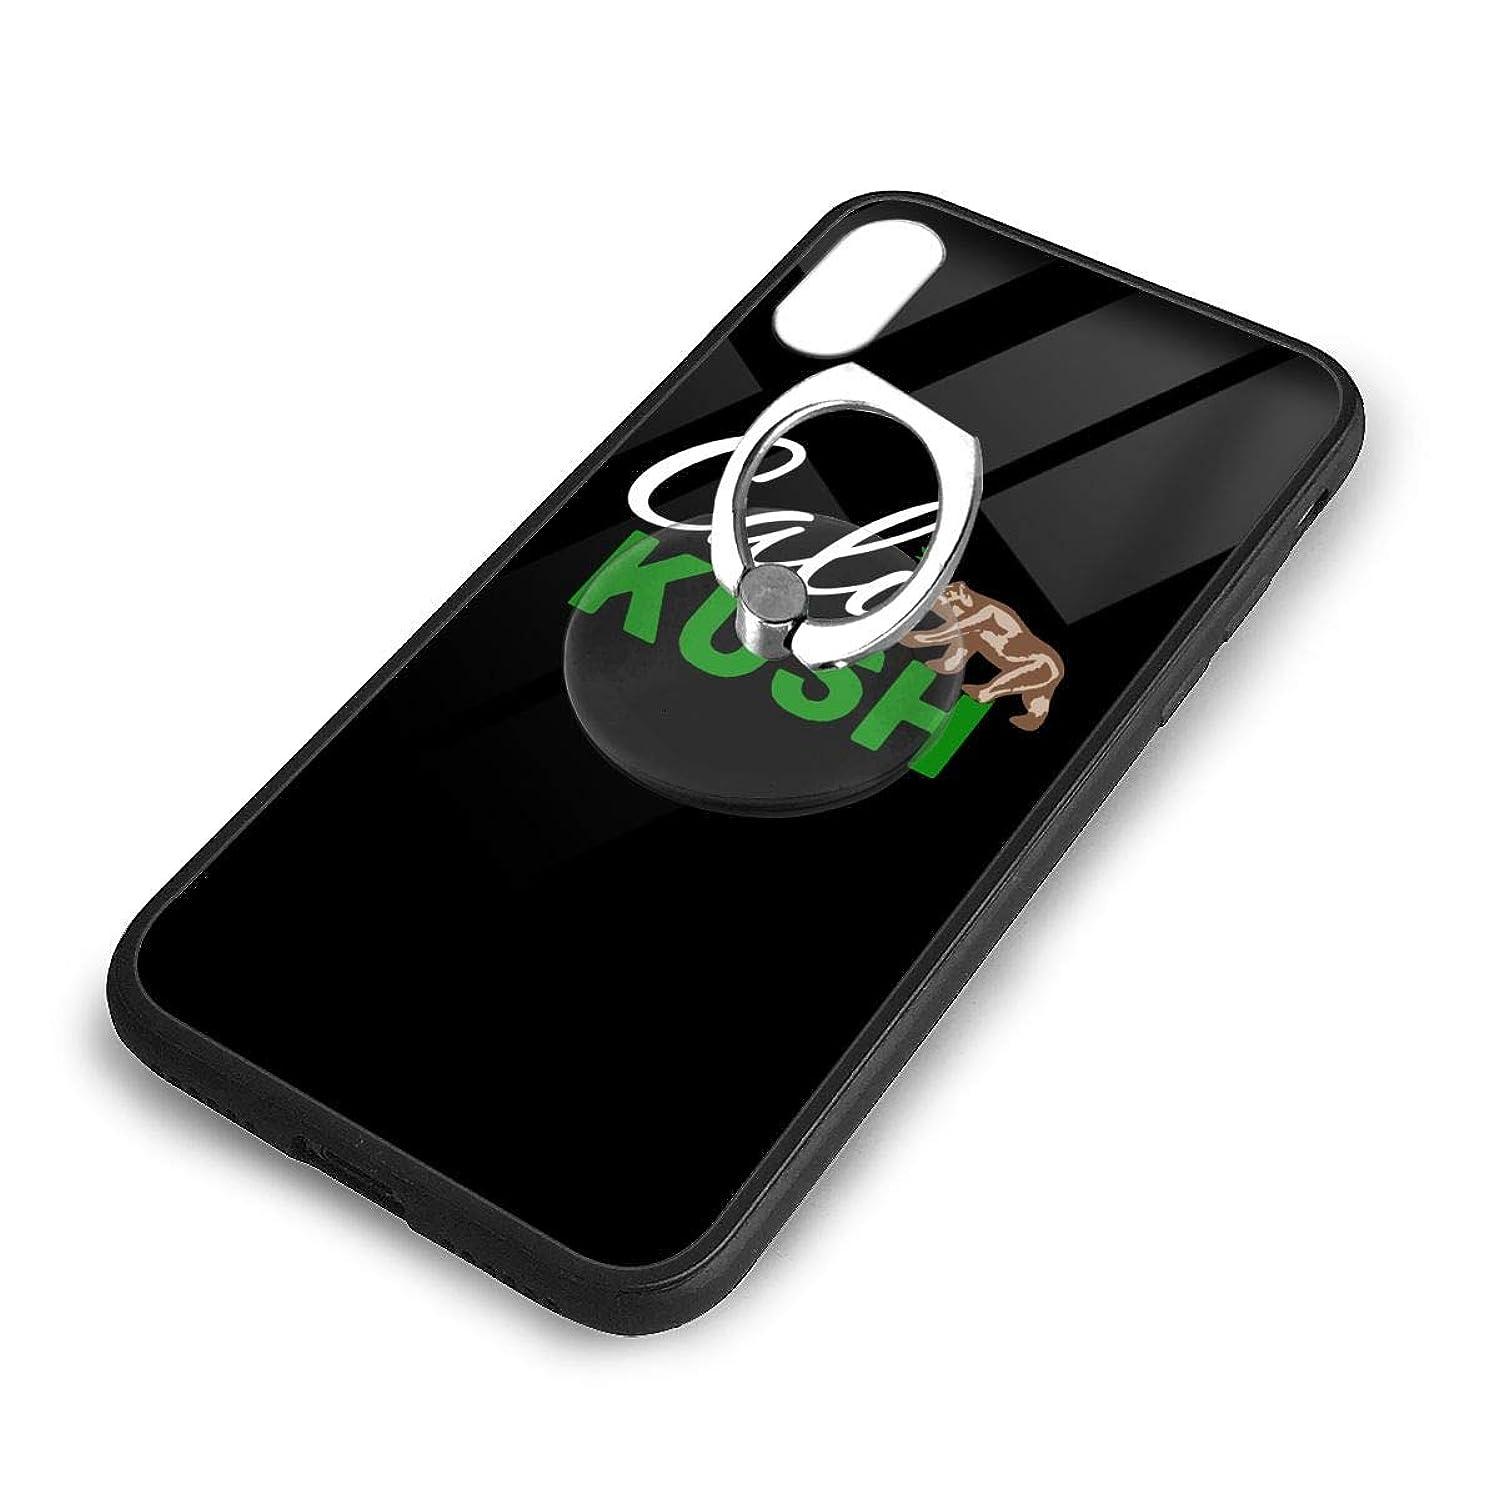 Cali Kush Weed California Republic iPhone X/XS Case Cute TPU Glass Phone Case Dustproof Phone Case with Universal Phone Ring Bracket Set